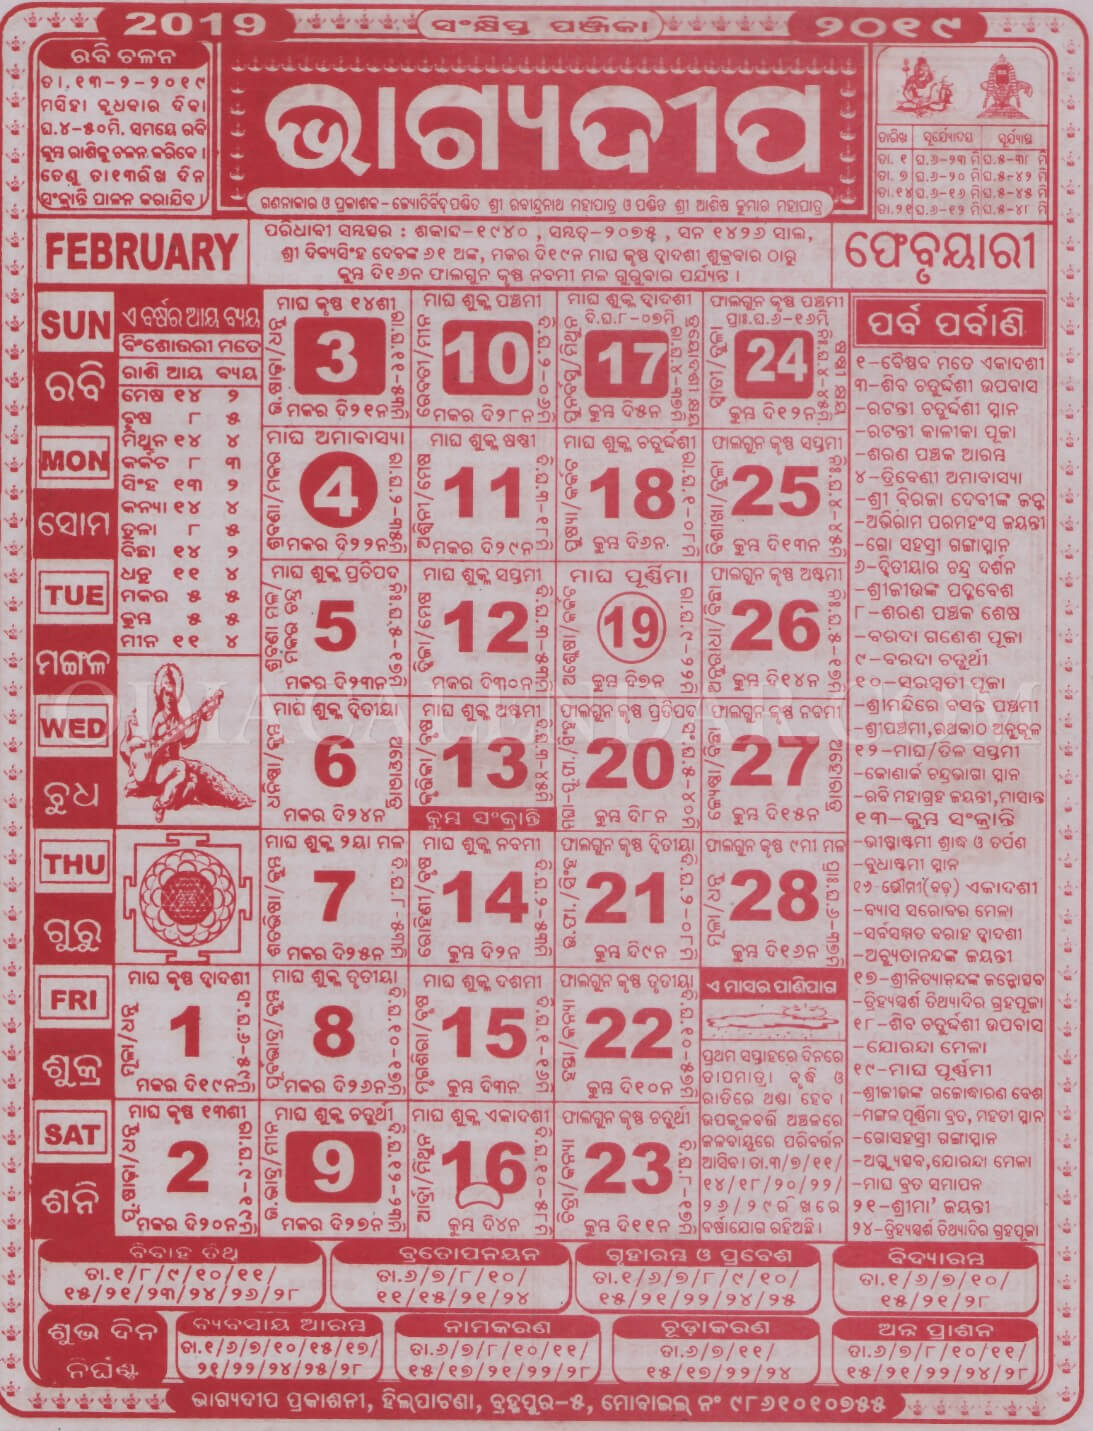 Bhagyadeep Odia Calendar 2019 | Odia Calendar 2019 | Odia with Odia Calendar Bhagyadeep